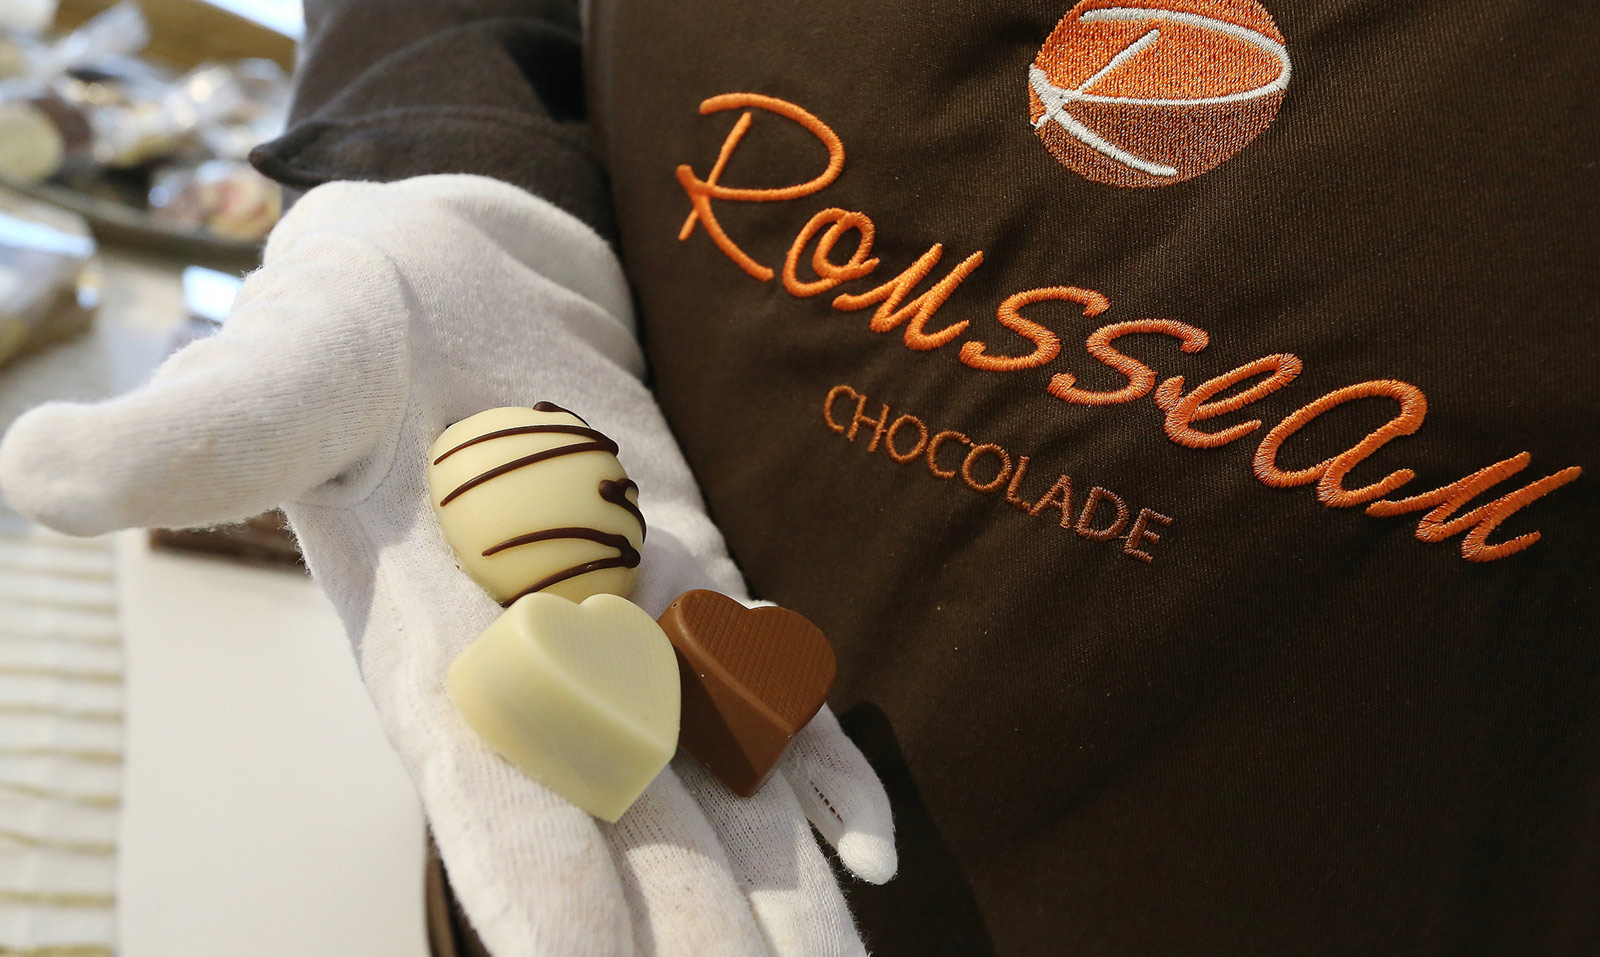 schokolade-duesseldorf-slide-4